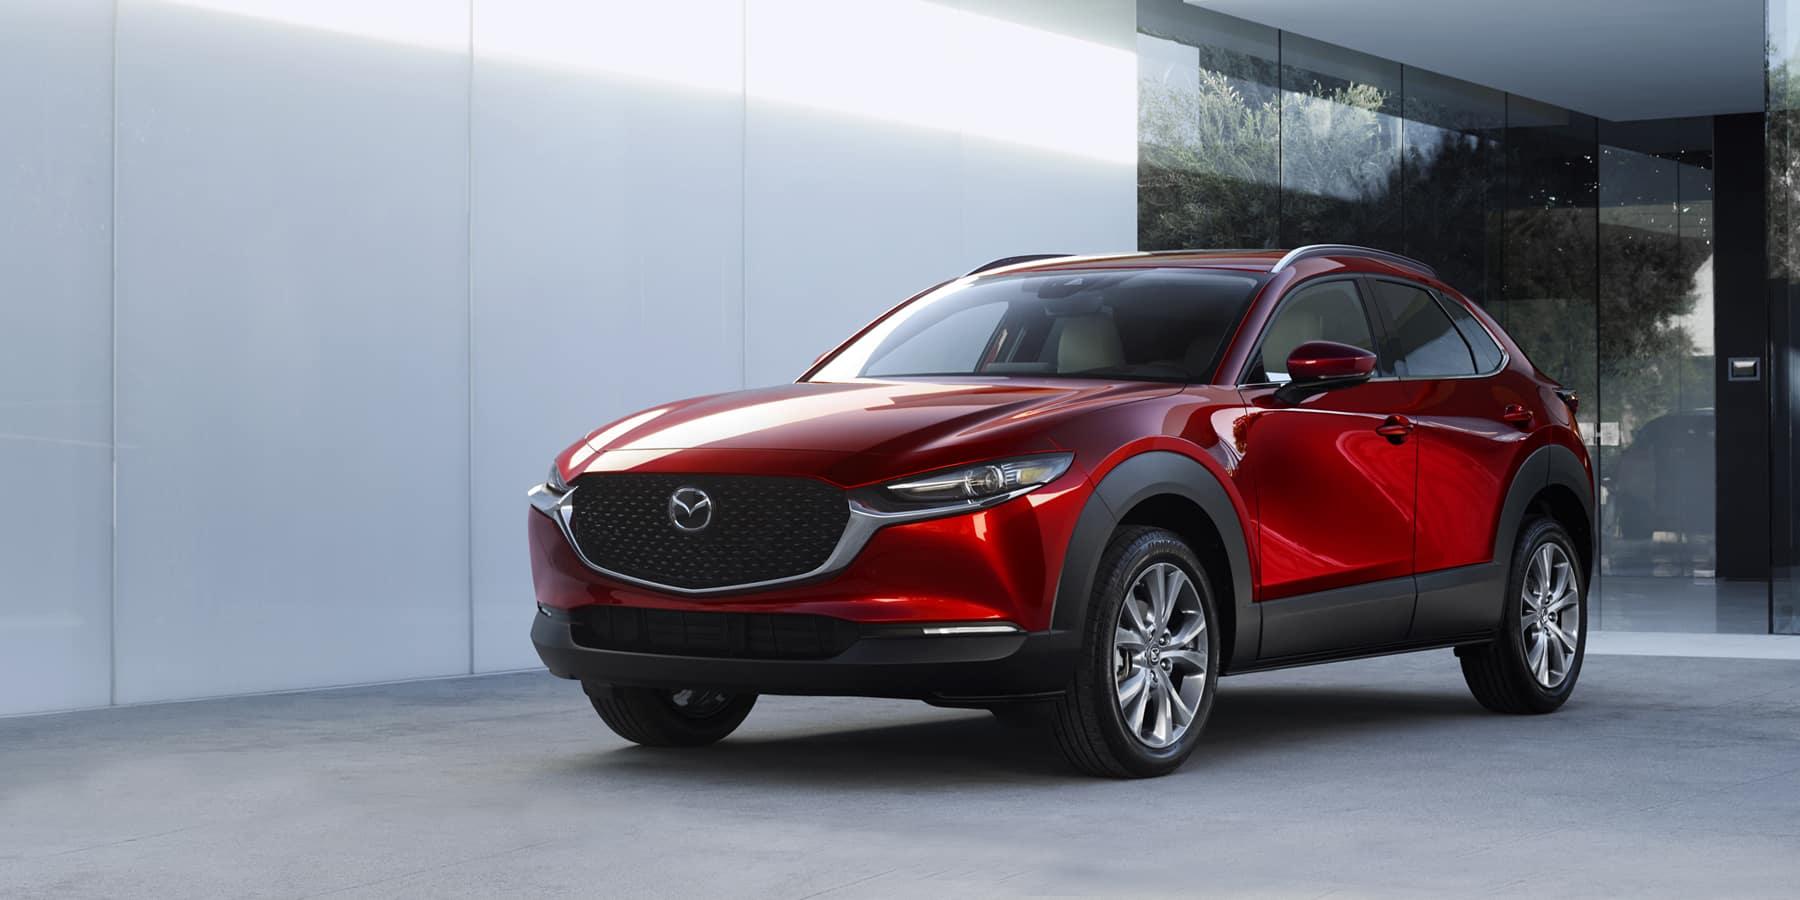 2020 Mazda CX-30 for sale near White Bear Lake, MN